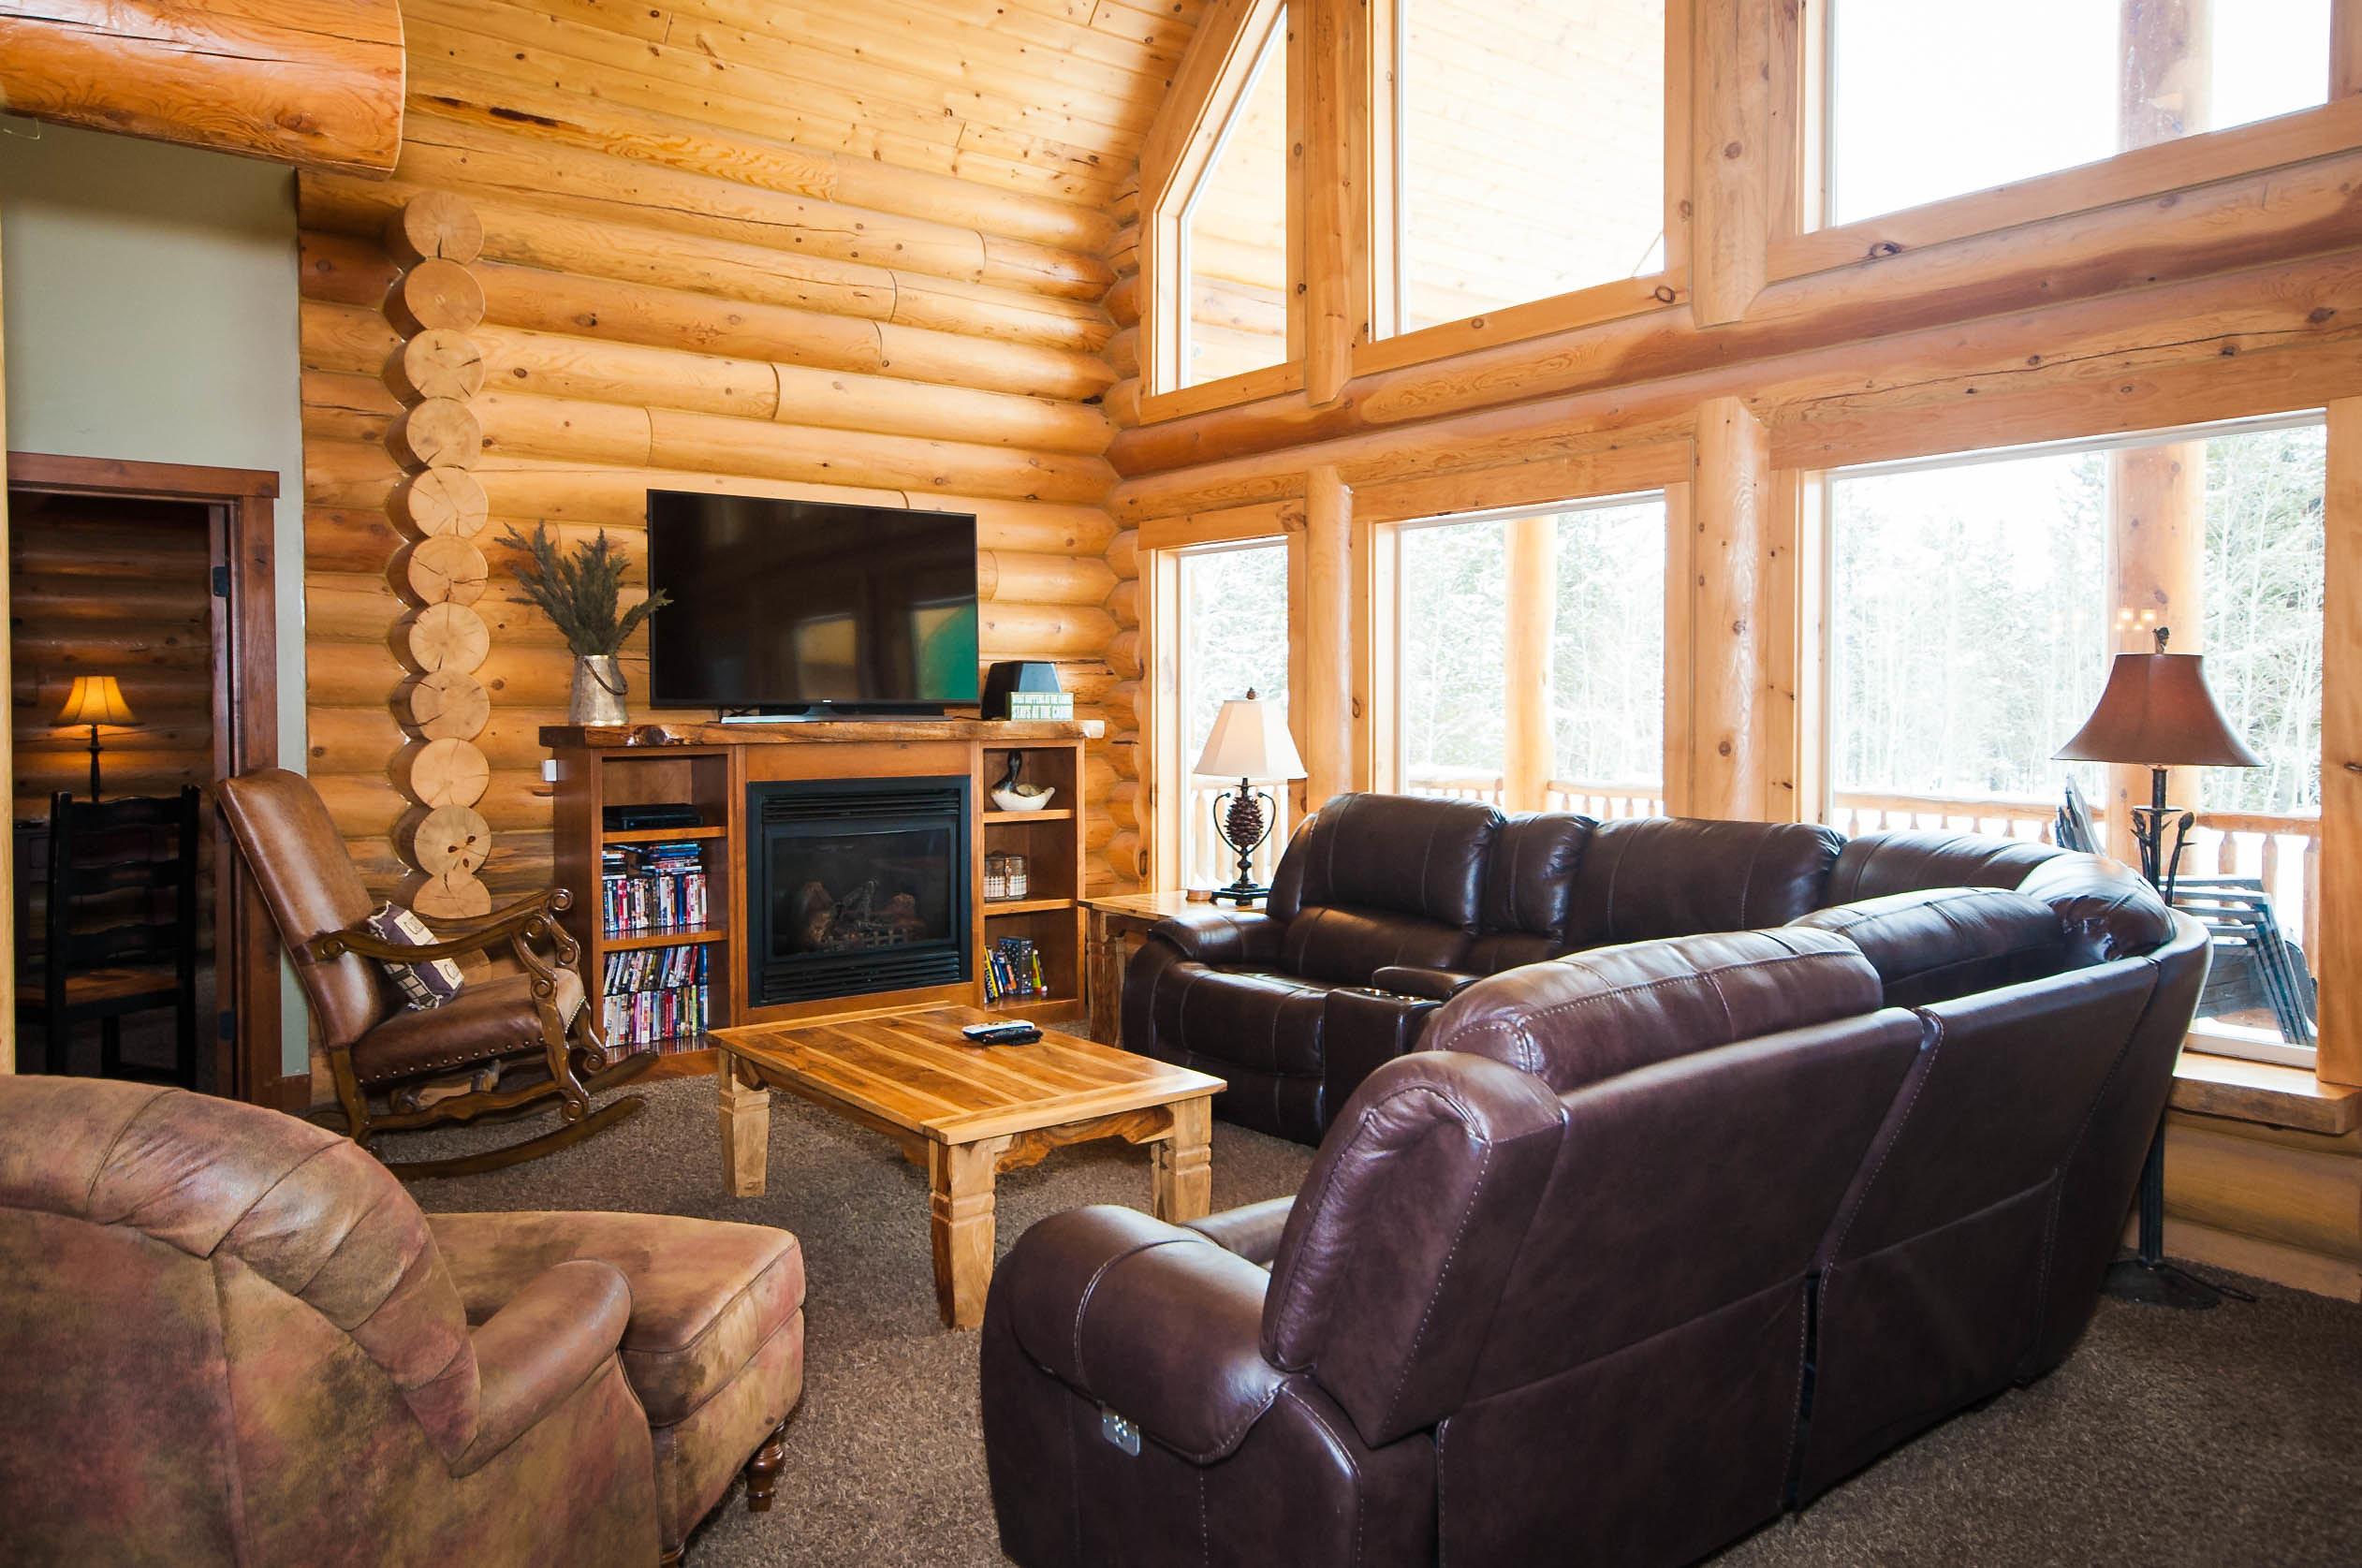 2. C67 Living Room